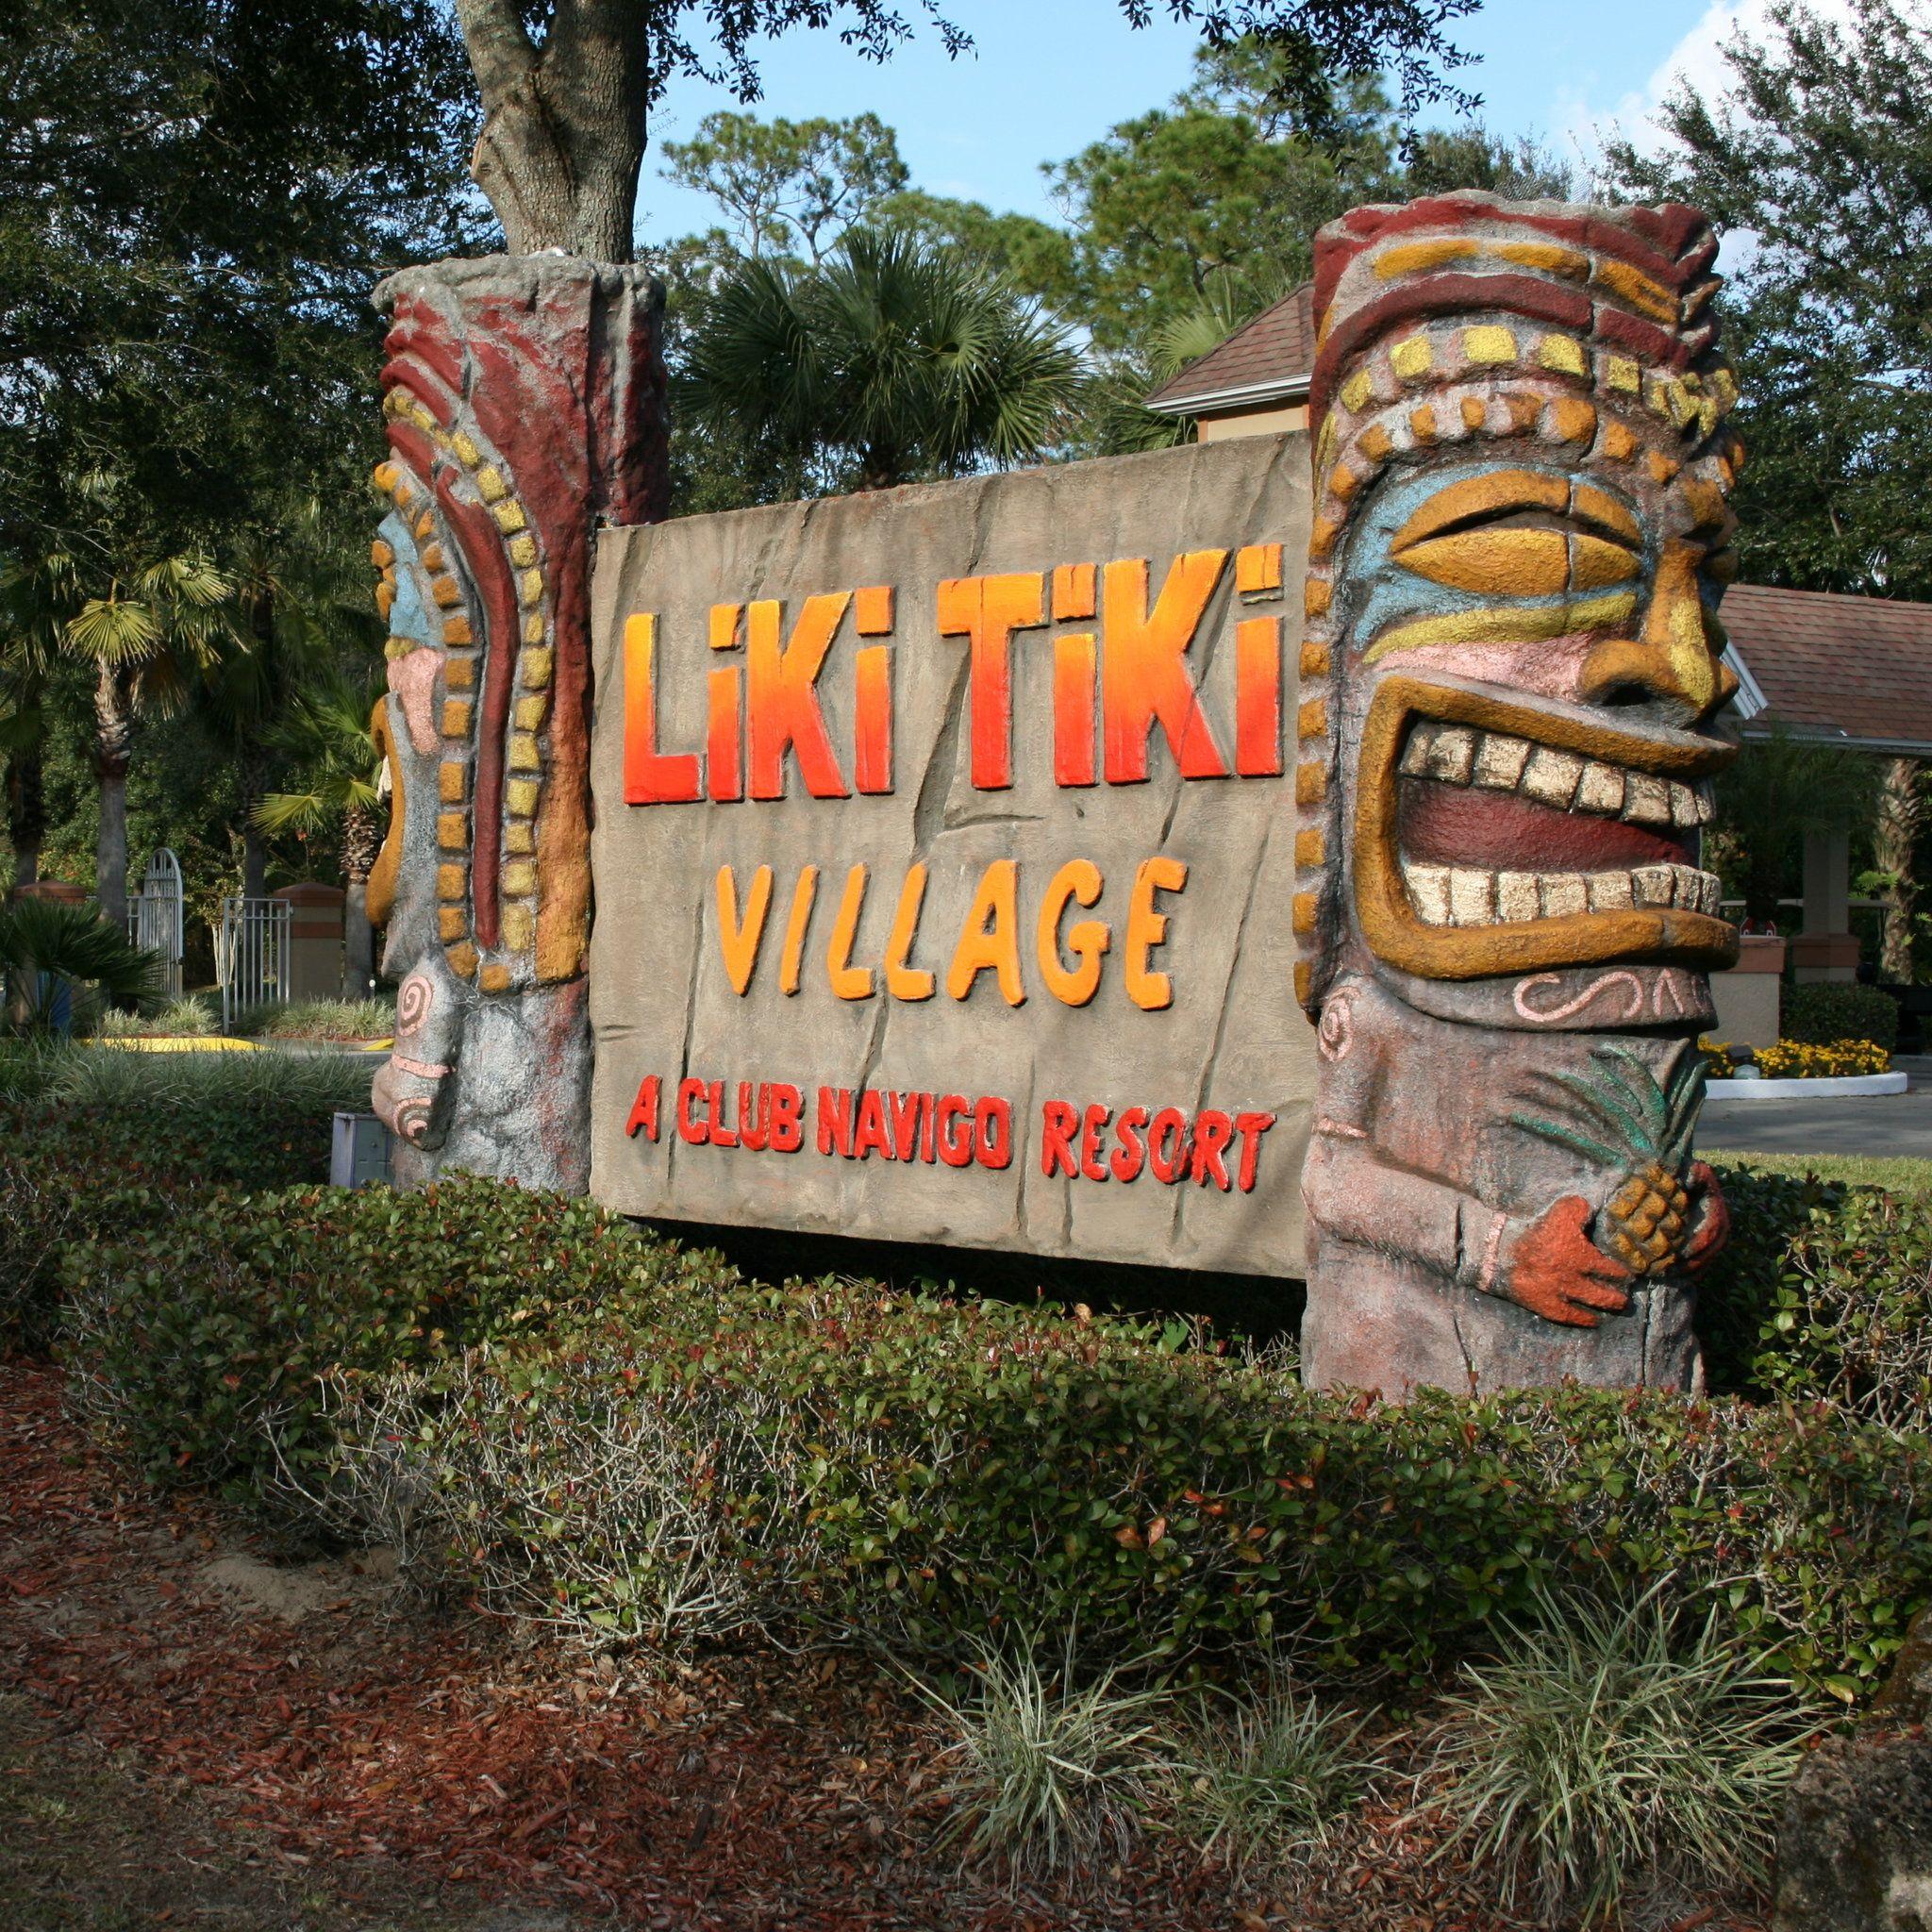 Liki Tiki Village Tiki Florida Hotels Orlando Vacation